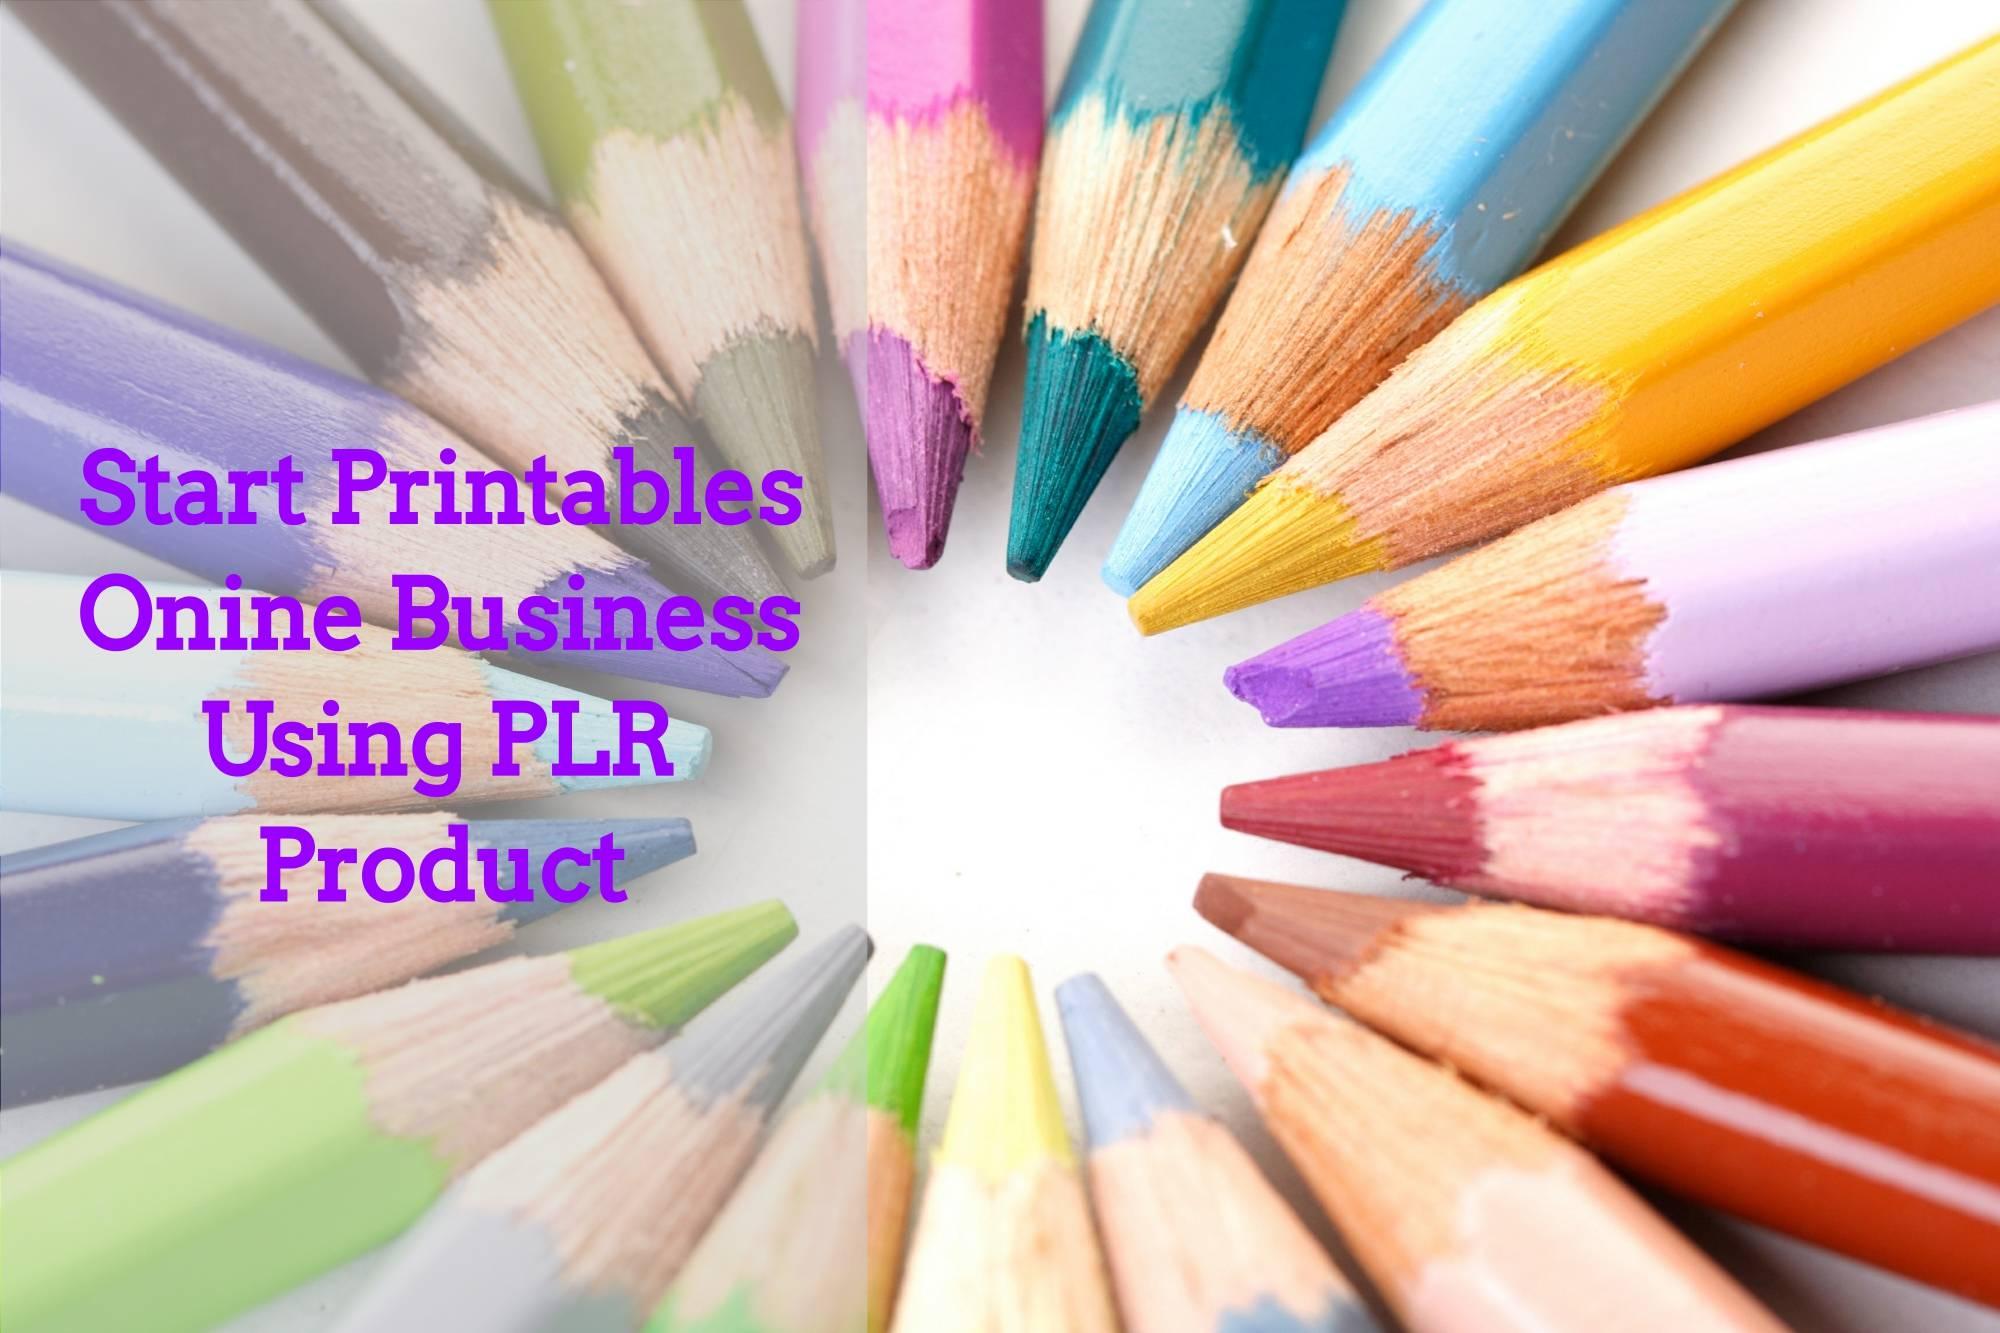 How to Start Selling Printables Online Using PLR